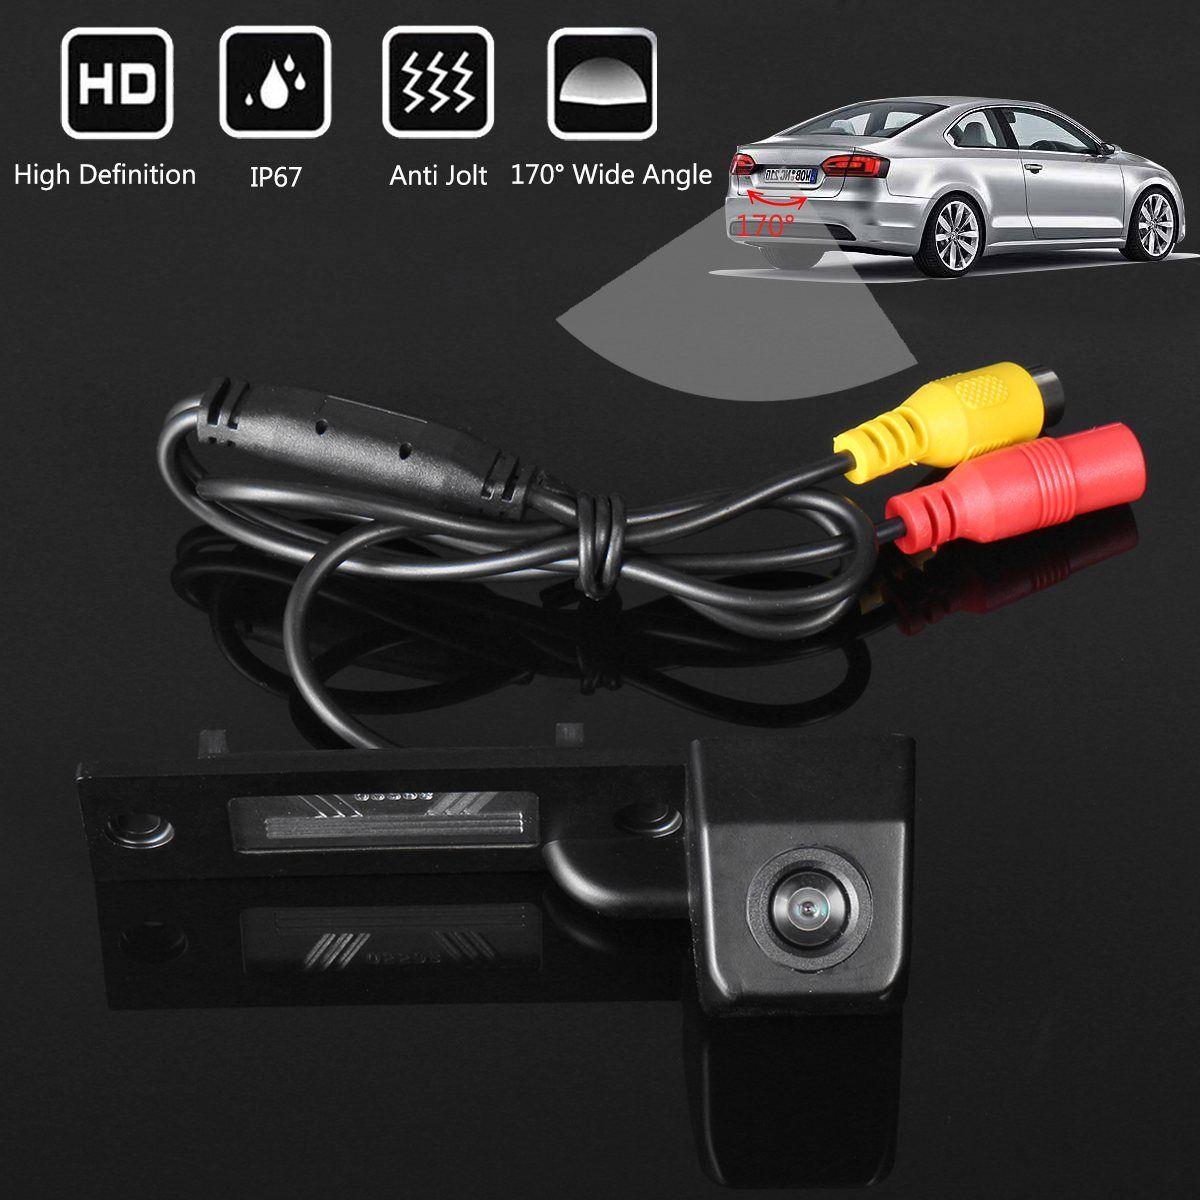 KROAK For VW/Transporter T5 T30 For Caddy/Passat 3B For Touran/Jetta Car CCD Rear View Cemara Reverse Backup Camera